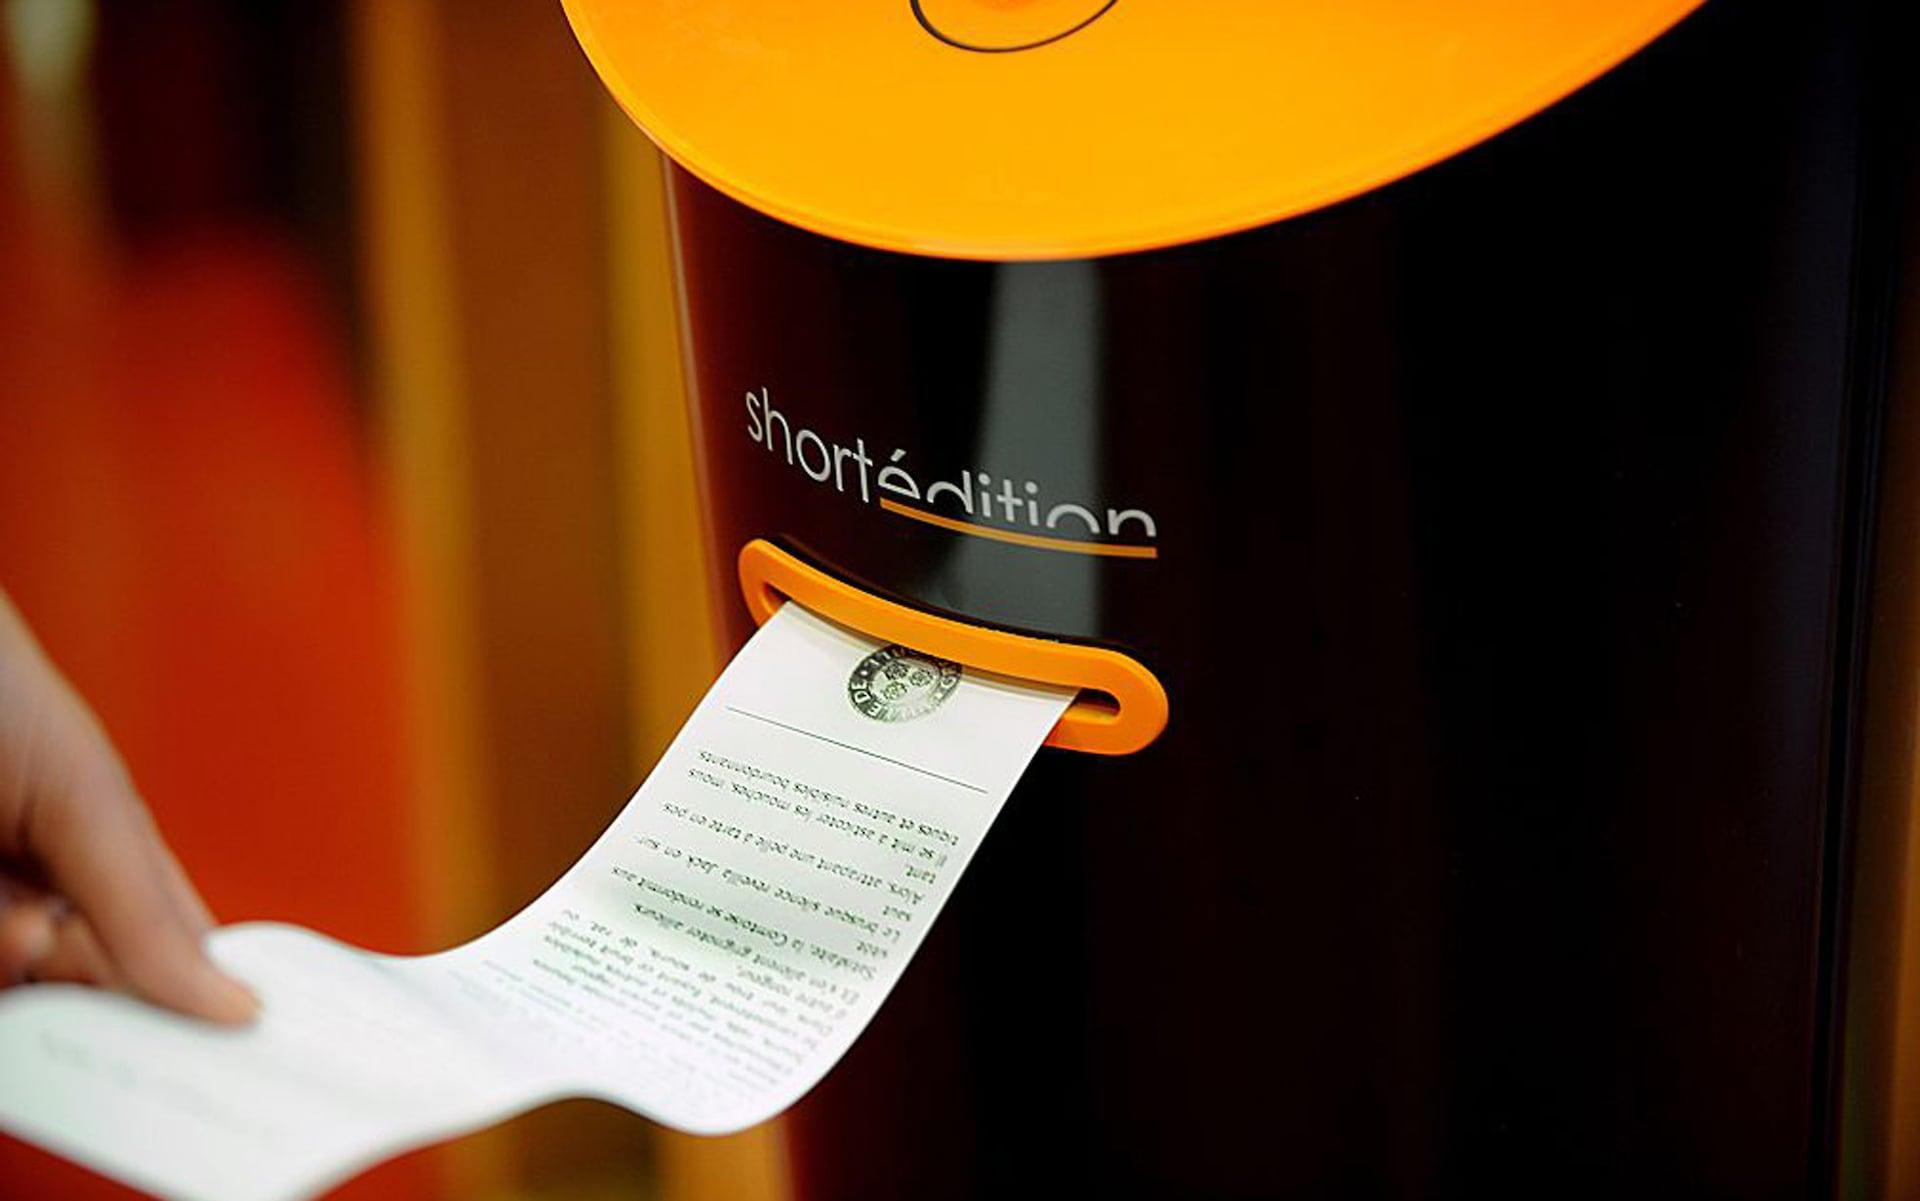 Image de [ UK ] Short story vending machines press French commuters' buttons